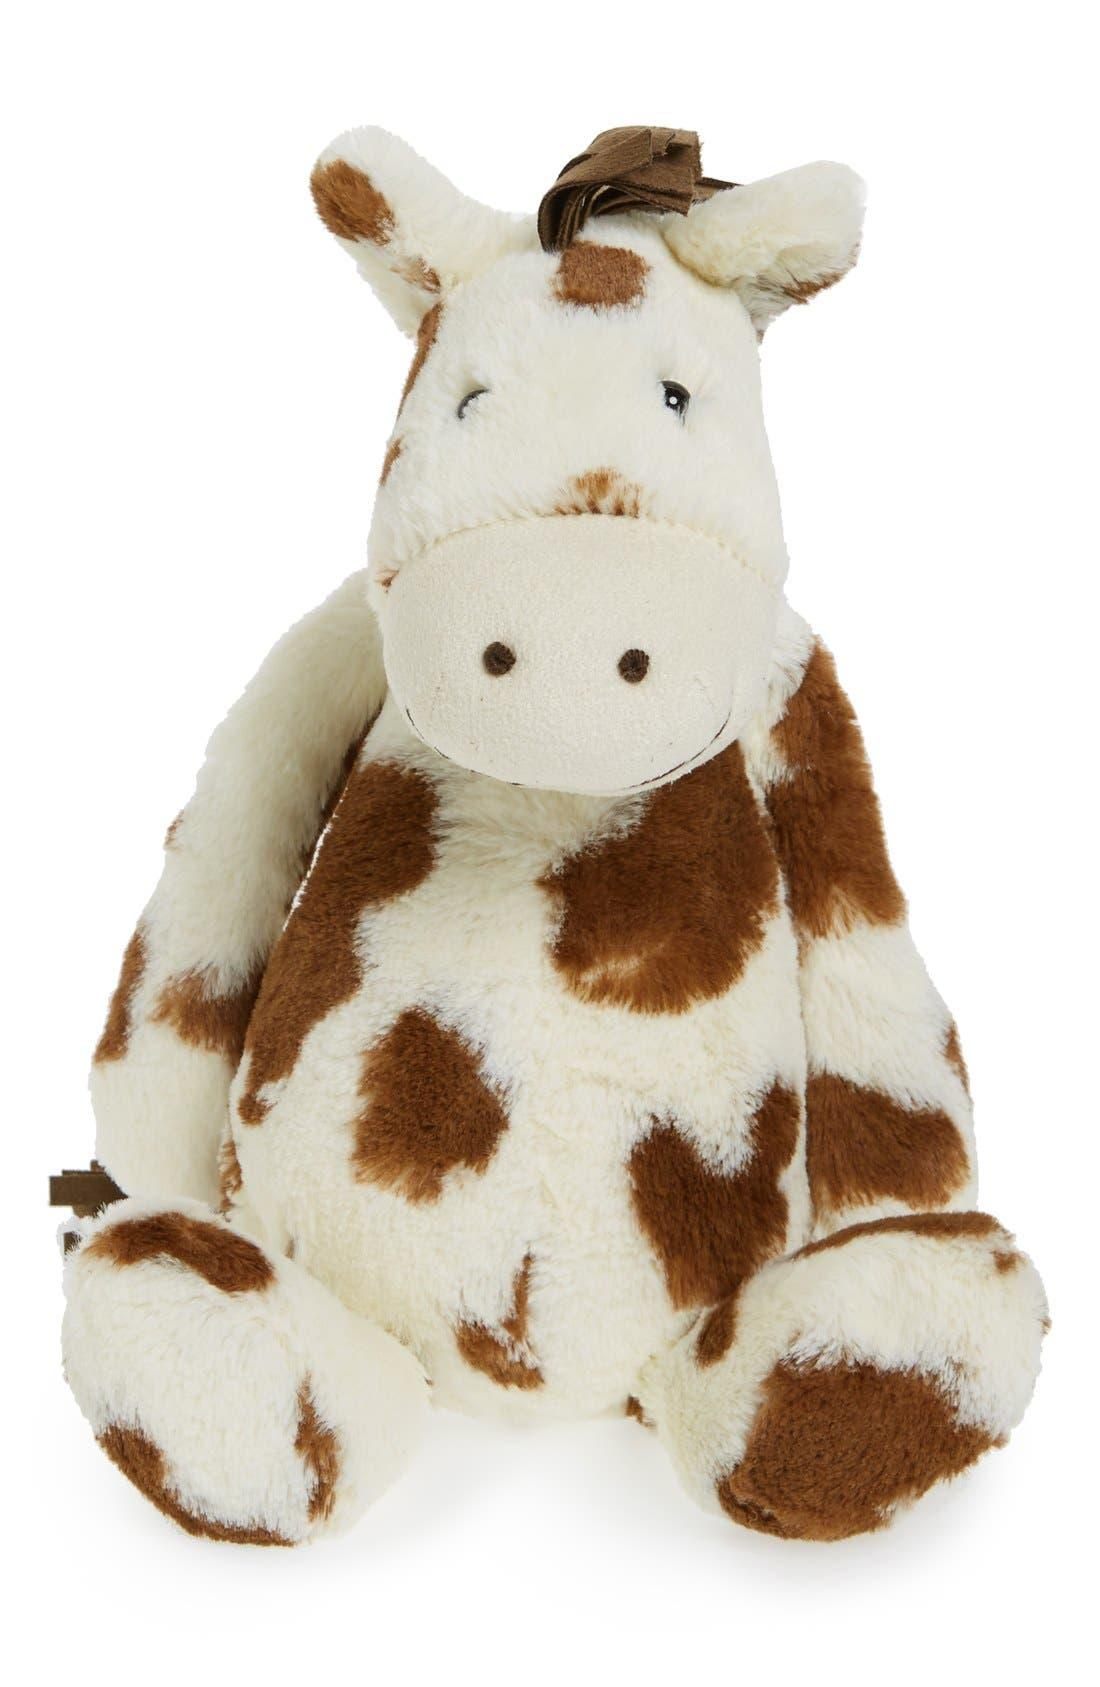 'Medium Bashful Pony' Stuffed Animal,                         Main,                         color, Cream/Tan